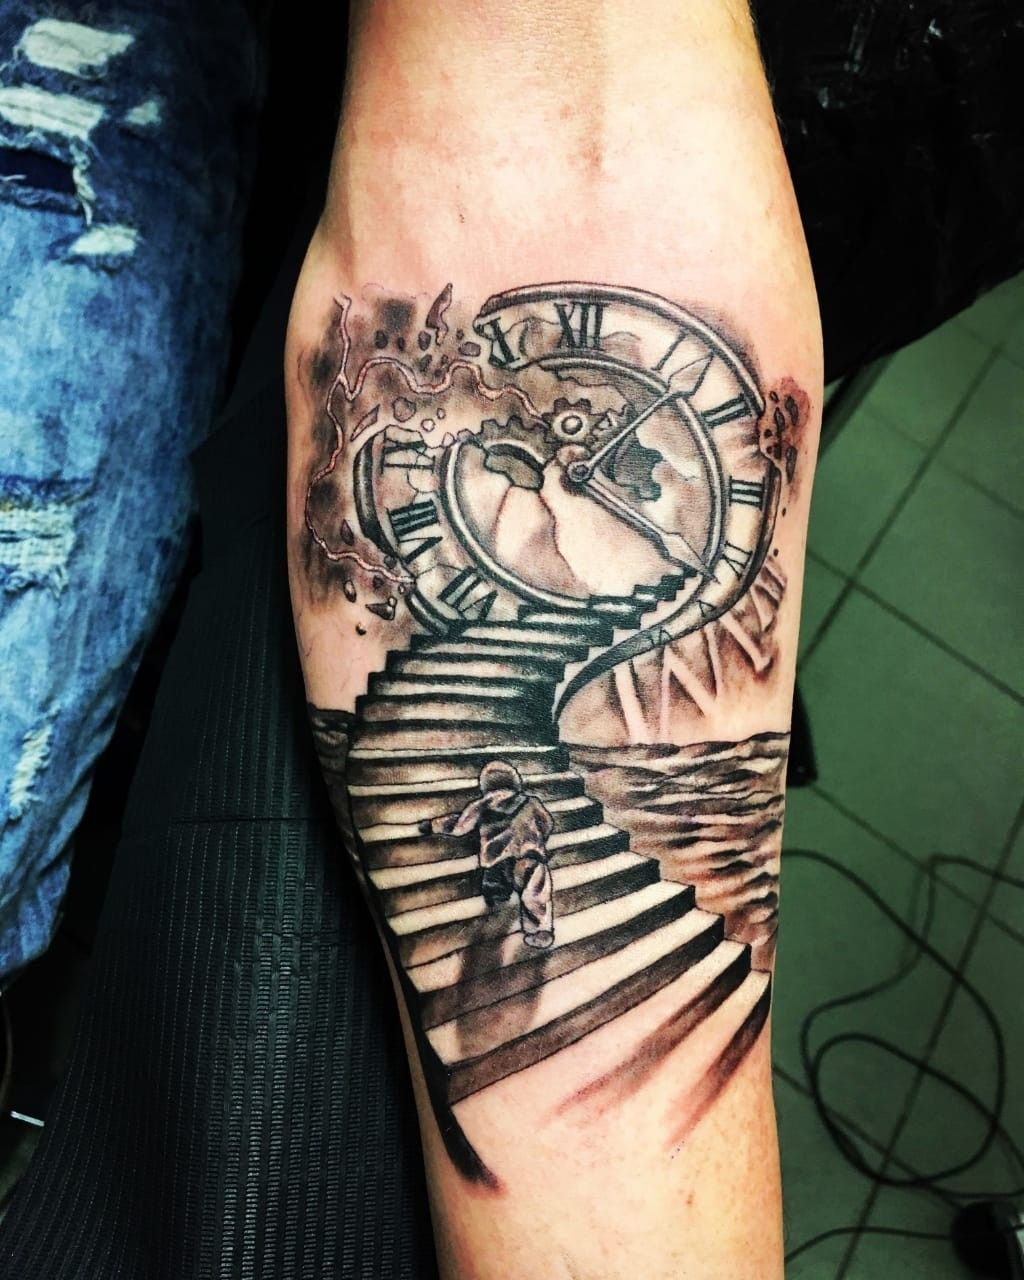 Pin By Un Tal Maykol Rojas On Chino Tattoos For Guys Sleeve Tattoos Tattoos